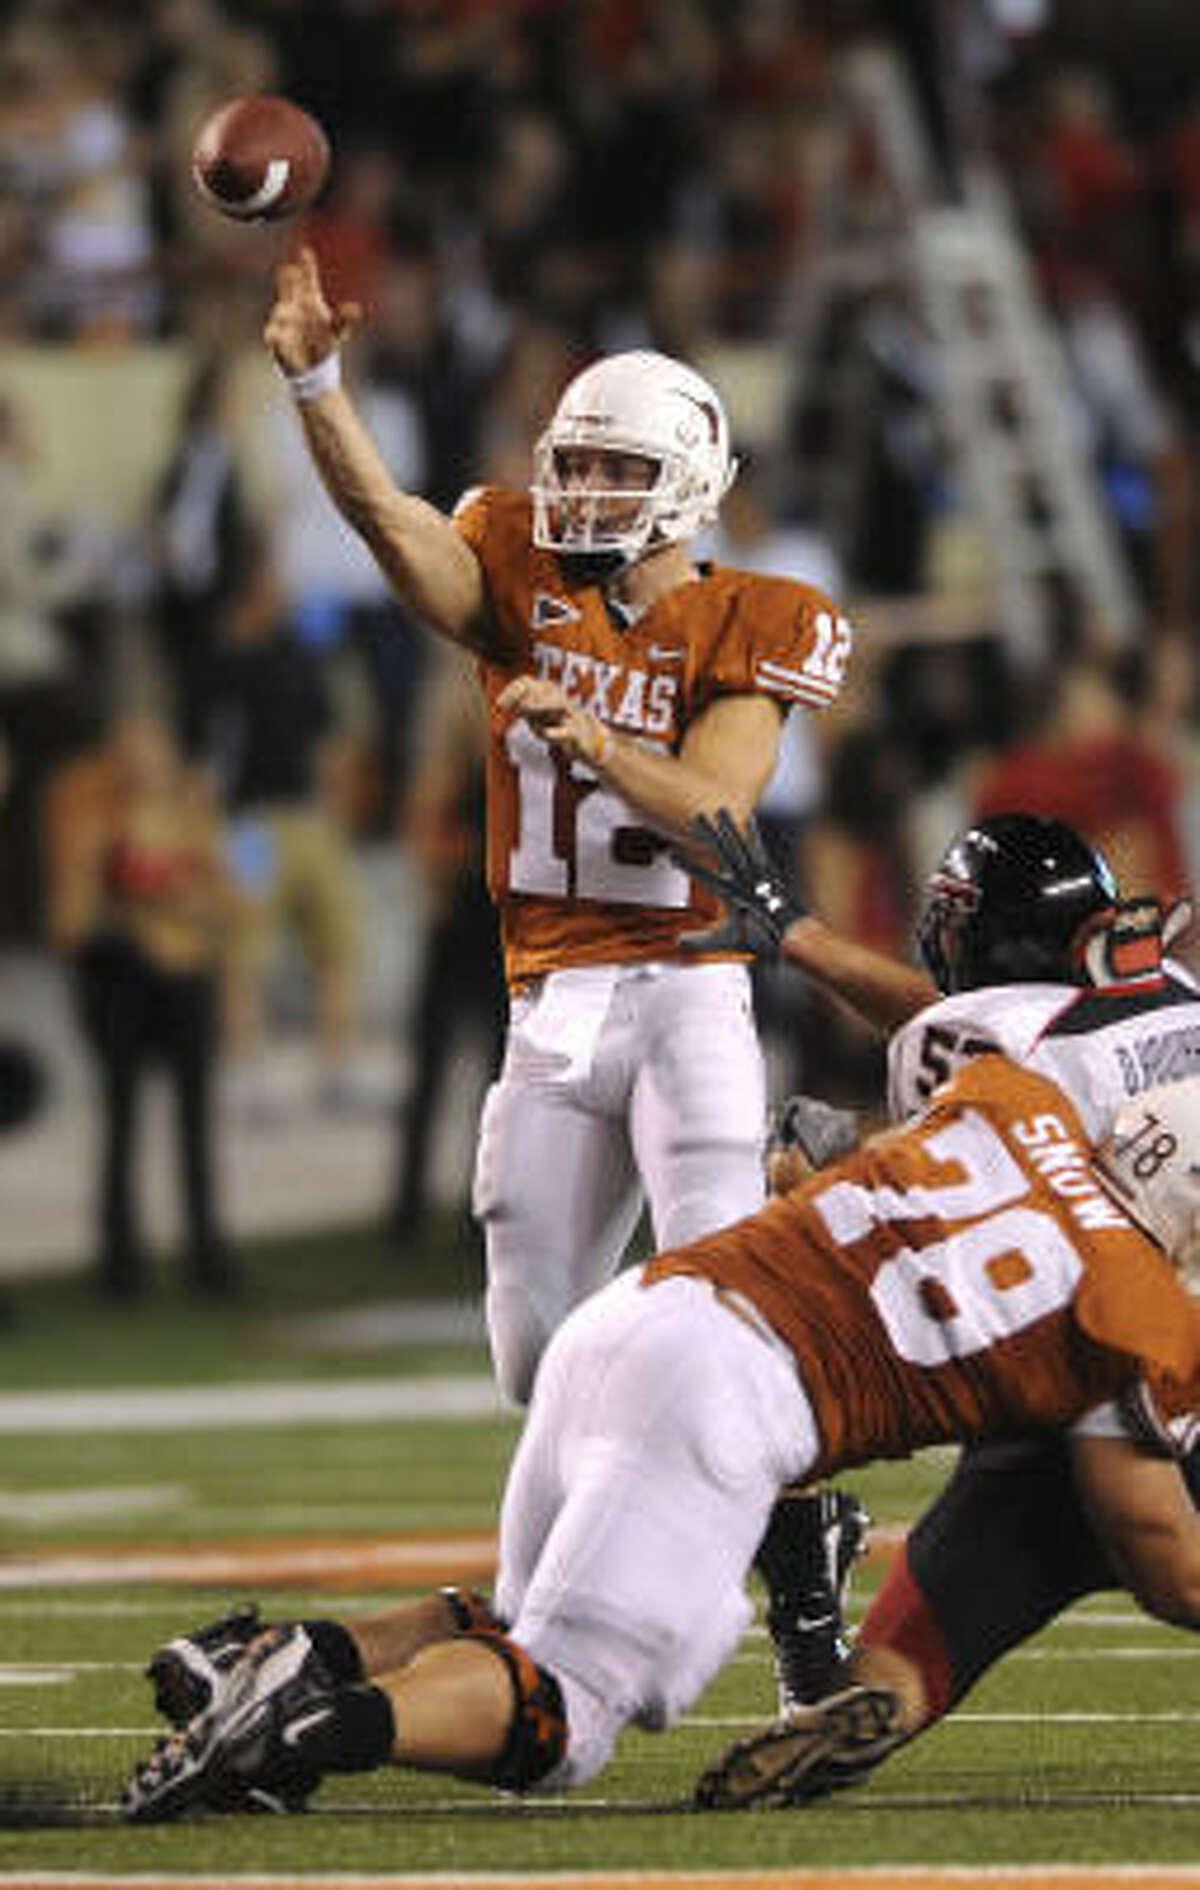 Texas quarterback Colt McCoy completes a pass during the second half.